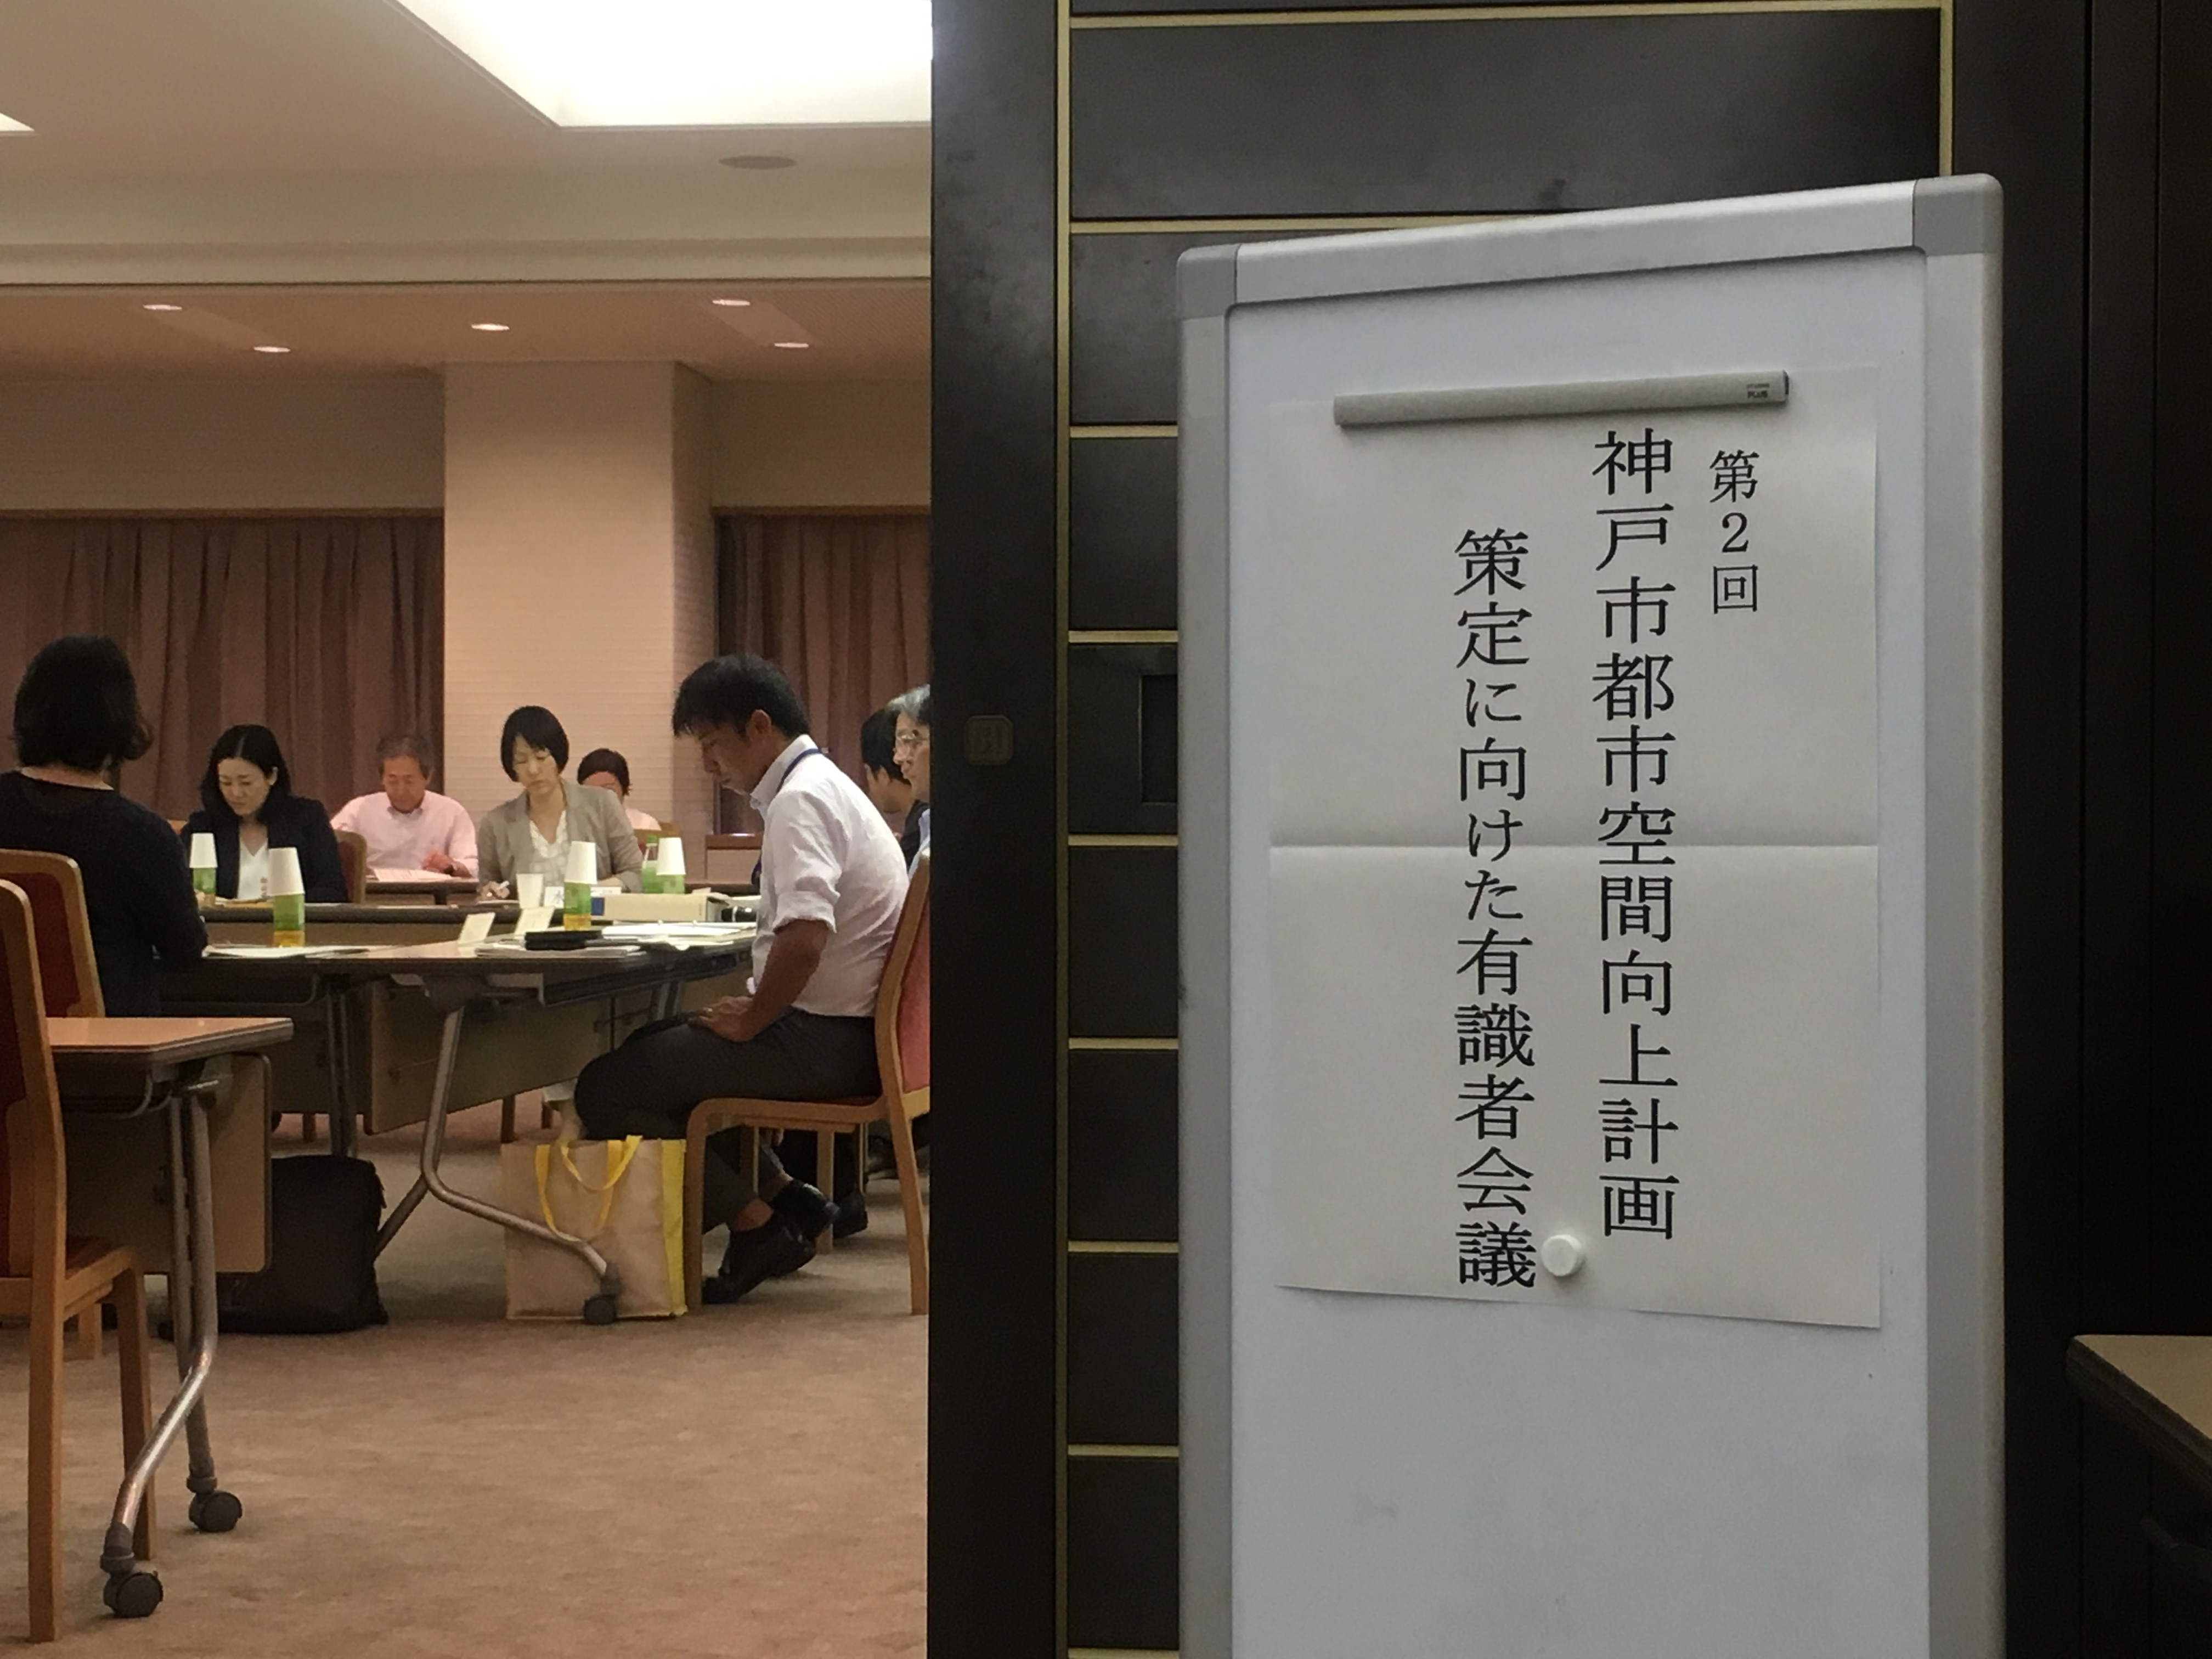 20180628神戸市空間向上計画の有識者会議